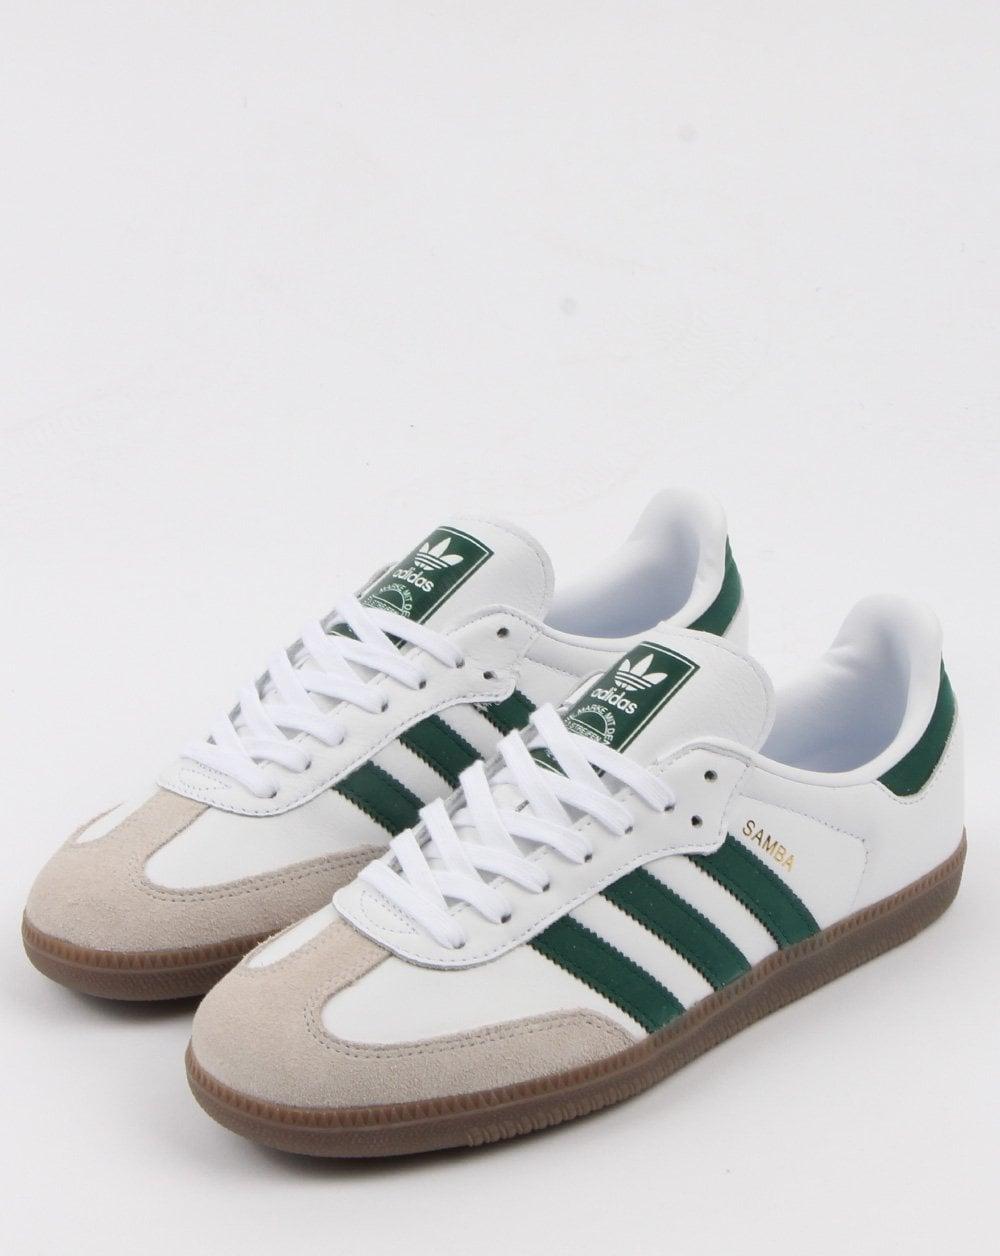 d8bfedec9 Adidas Samba, Og Trainers,White/collegiate Green | 80s casual classics